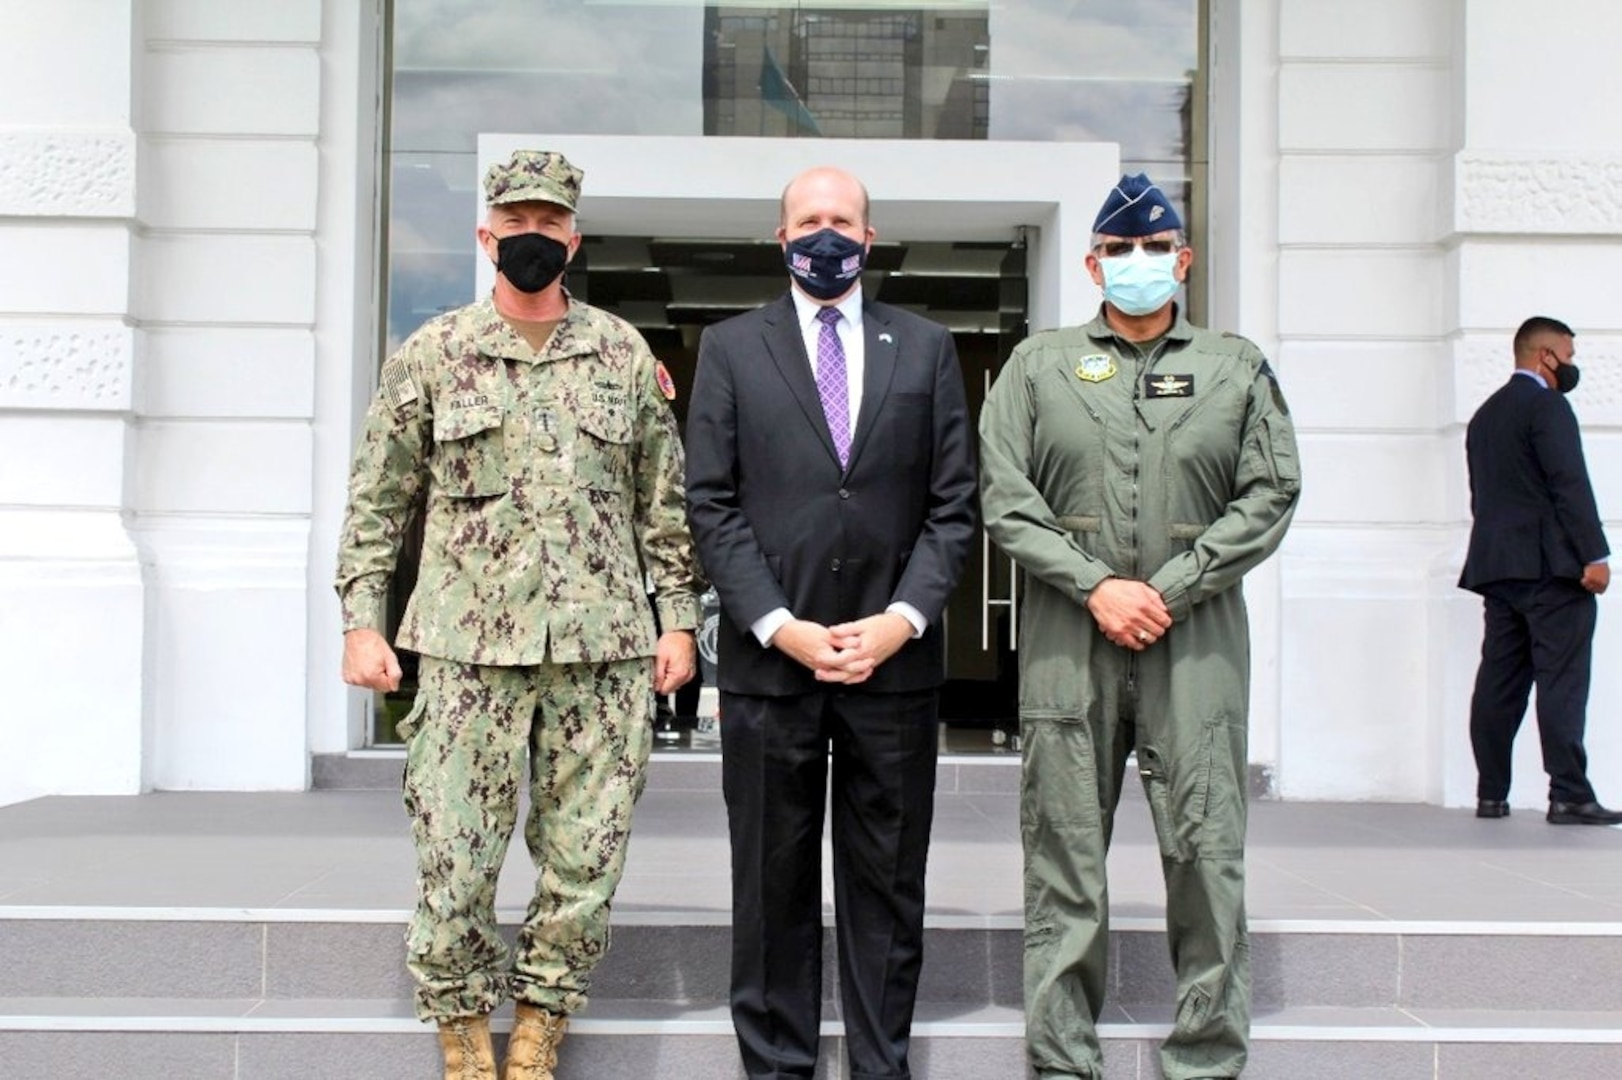 U.S. Navy Adm. Craig S. Faller, commander of U.S. Southern Command, meets with Guatemalan Minister of Defense Maj. Gen. Juan Carlos Alemán Soto.